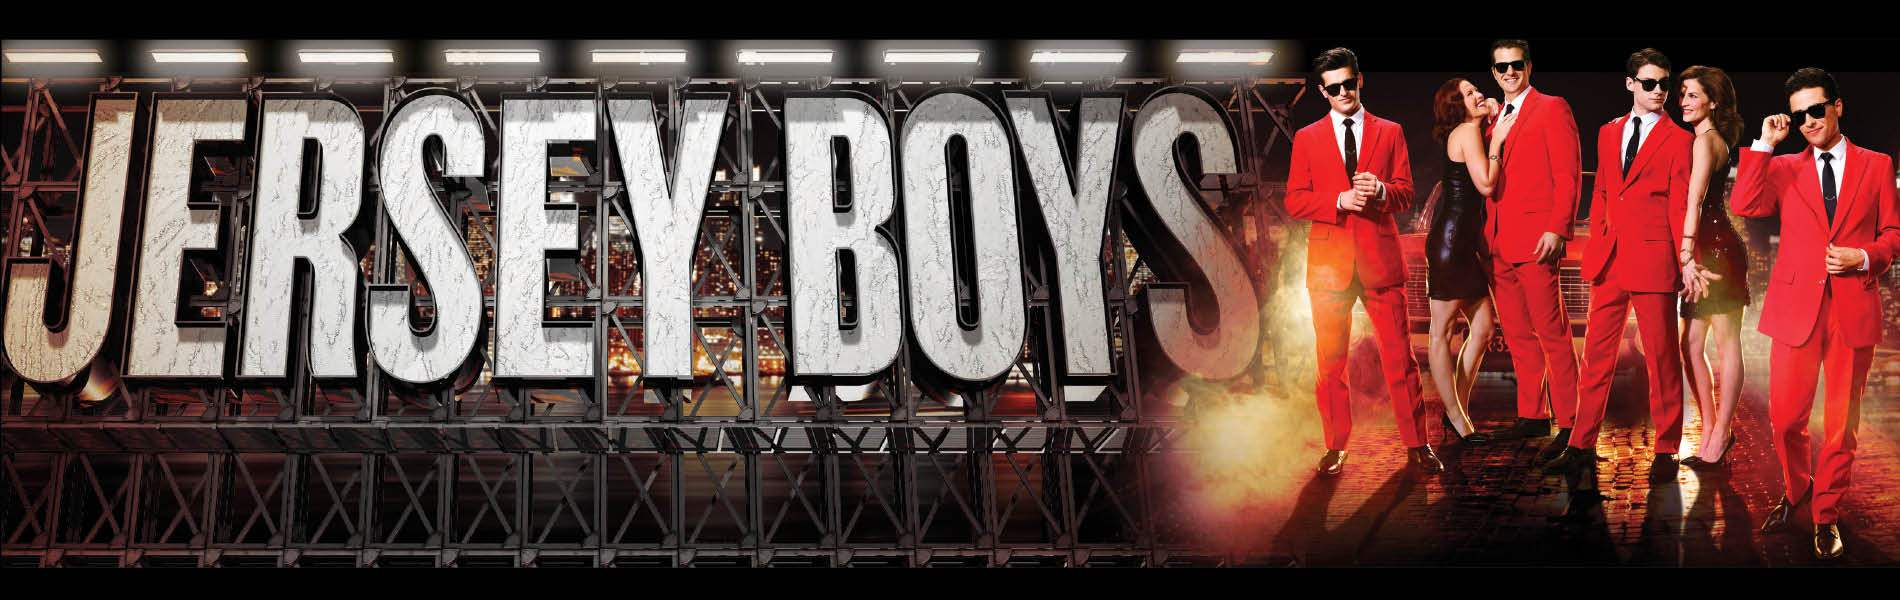 Jersey Boys Event Banner